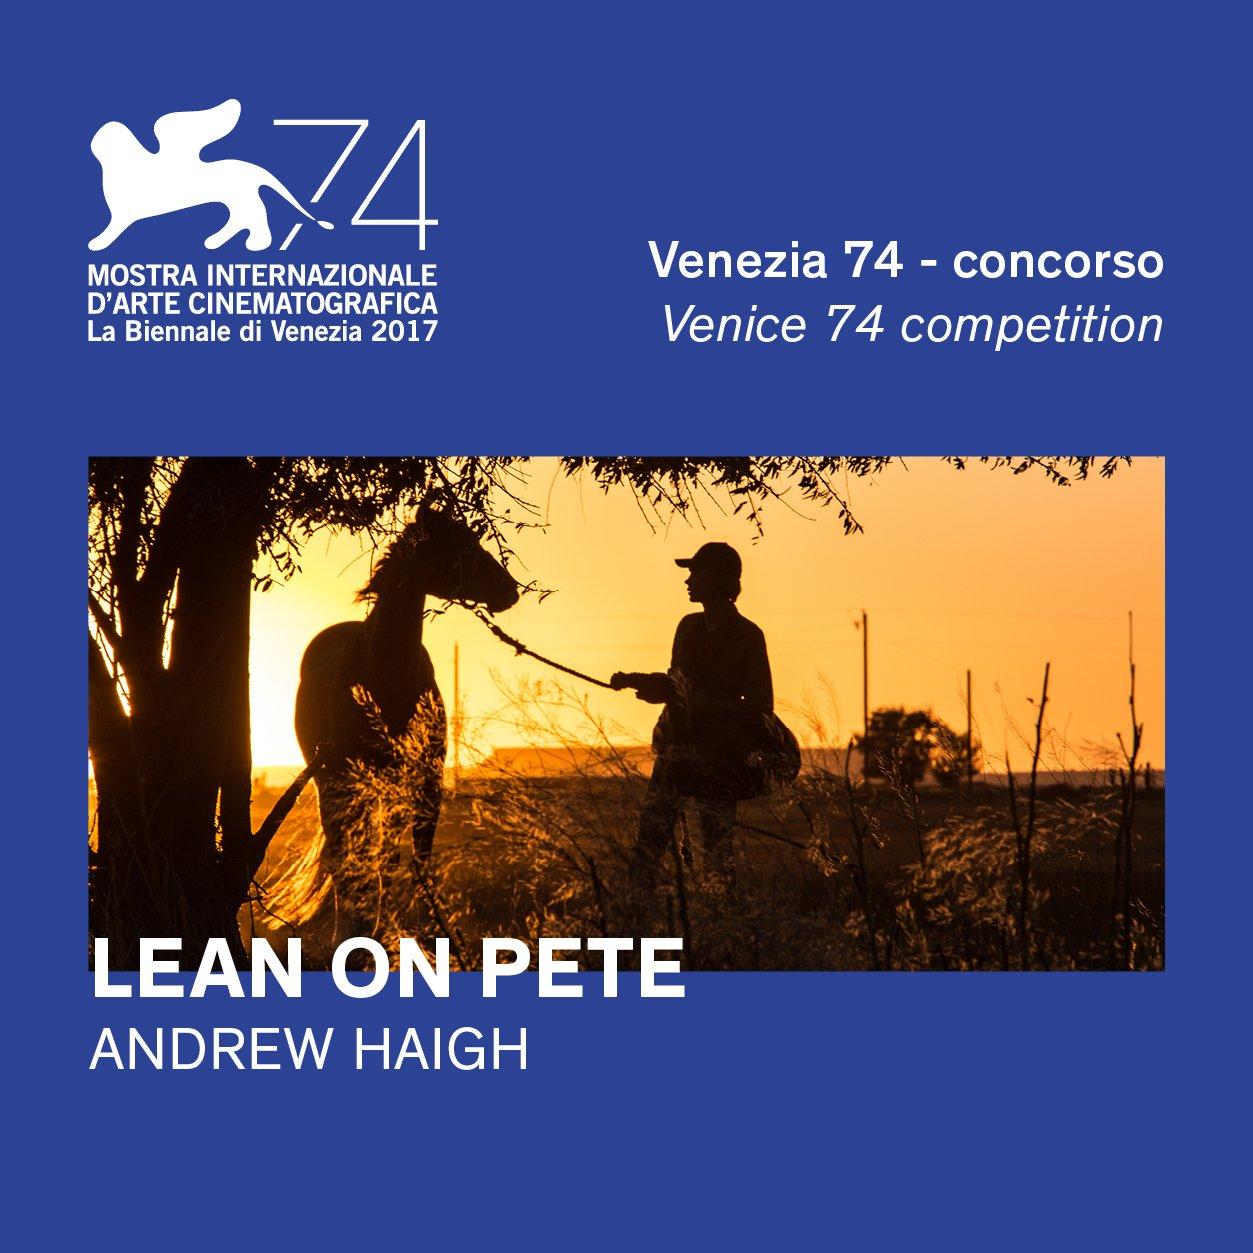 Festival de Veneza 2017 5/21